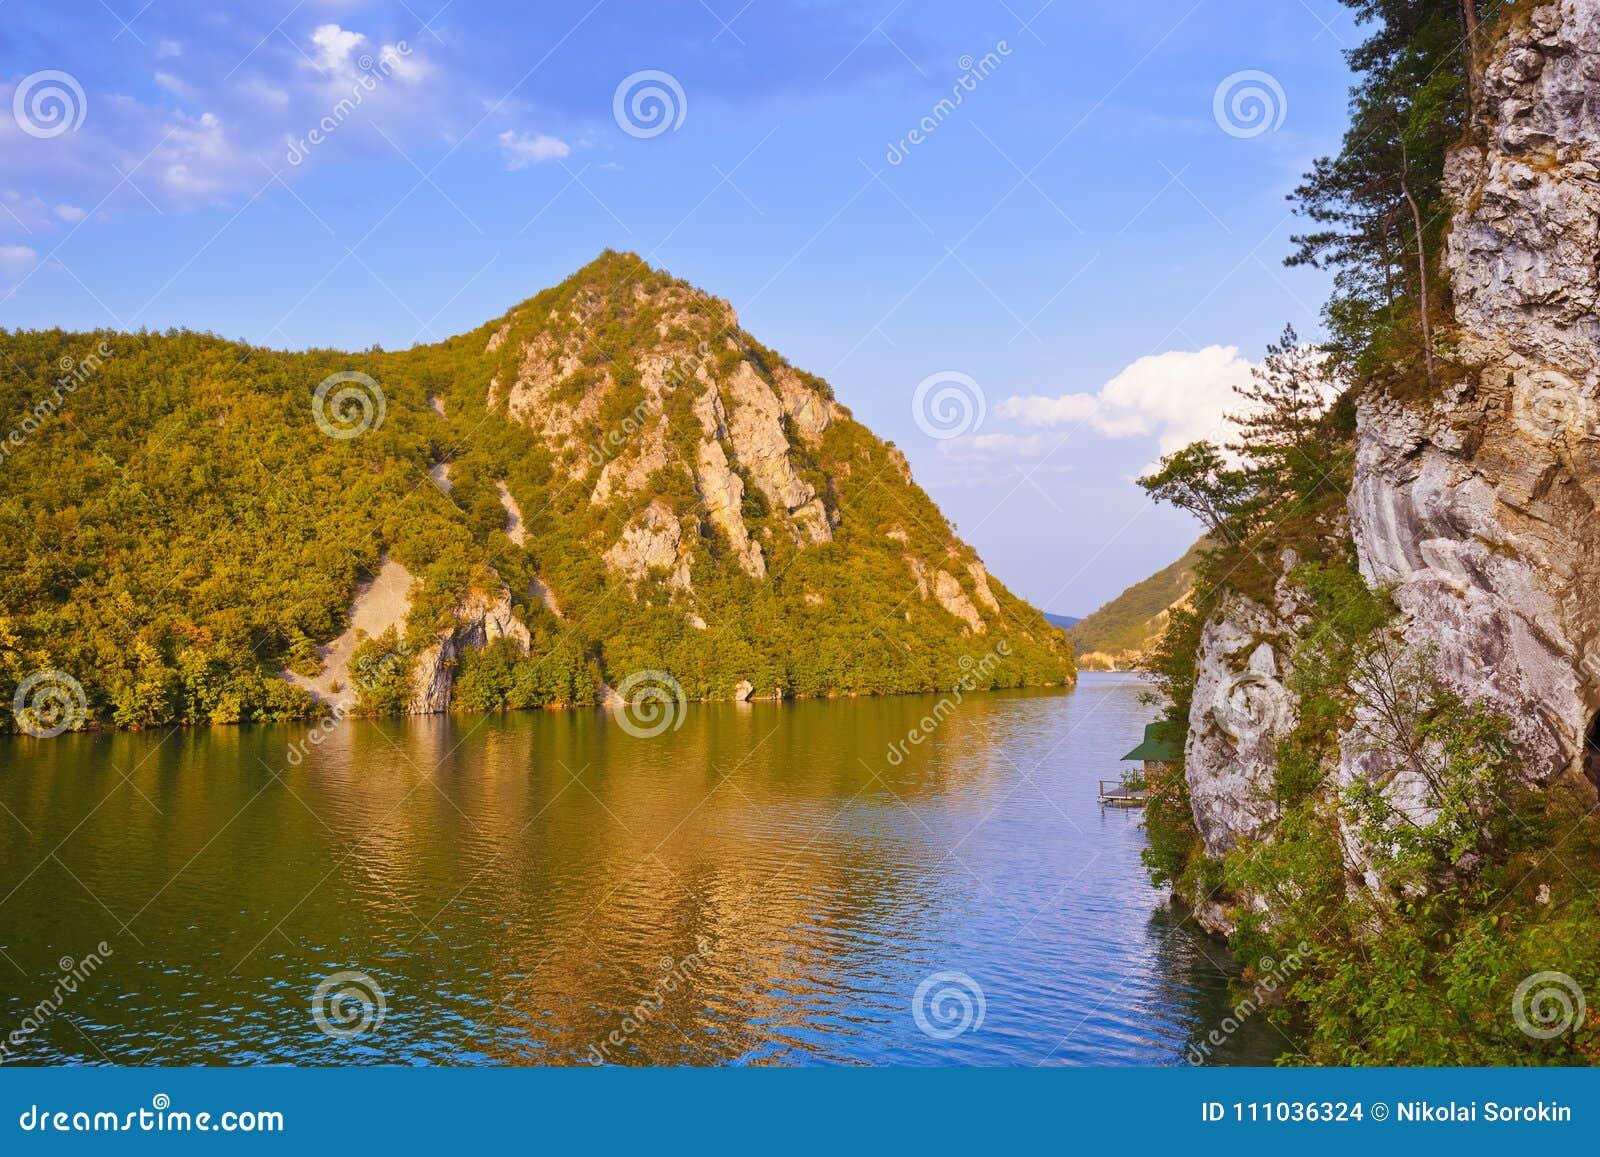 Fiume Drina - parco naturale nazionale in Serbia